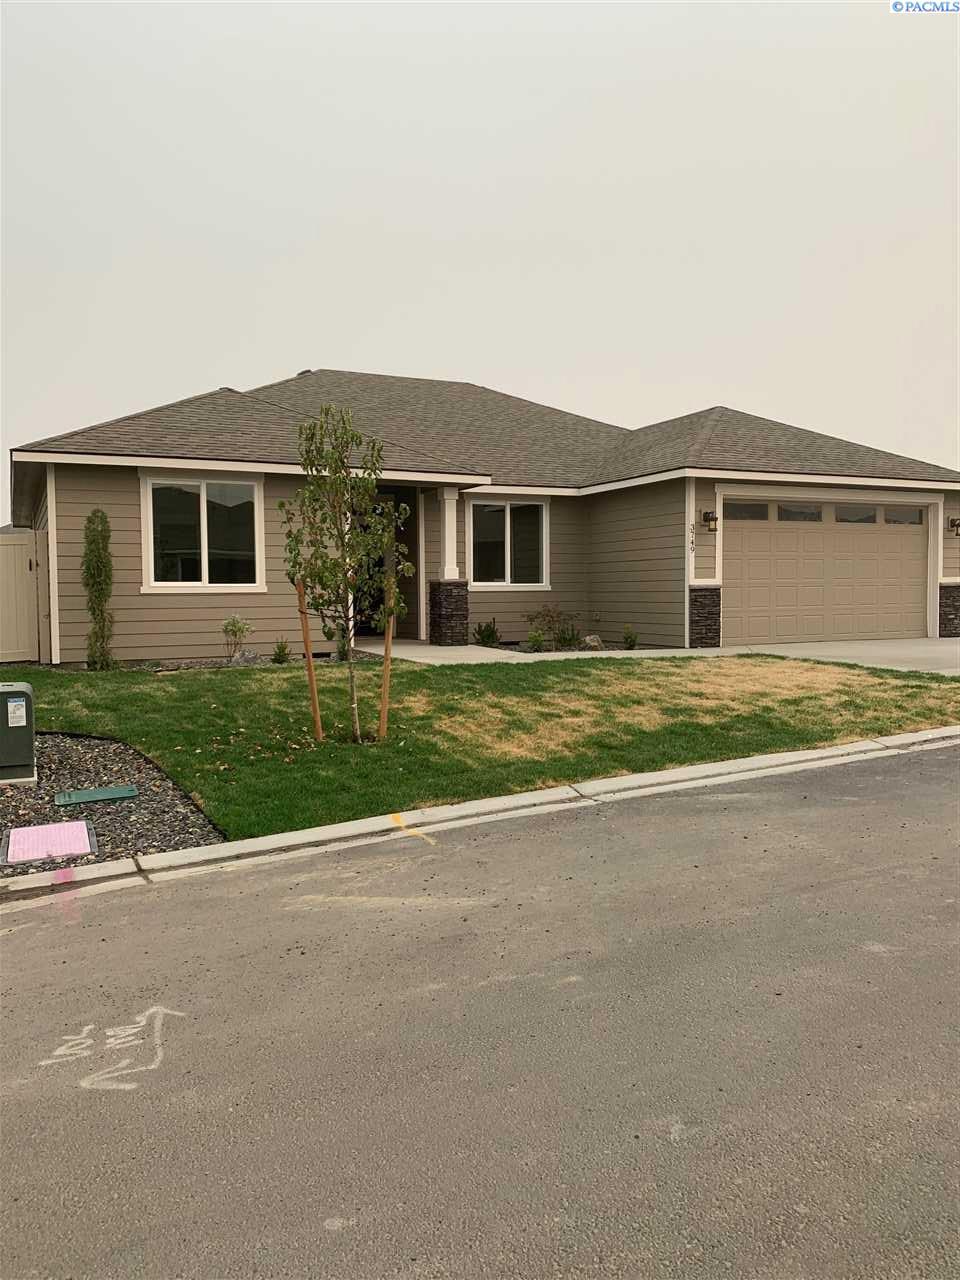 Single Family Homes for Sale at 3725 S Taft Street Kennewick, Washington 99338 United States